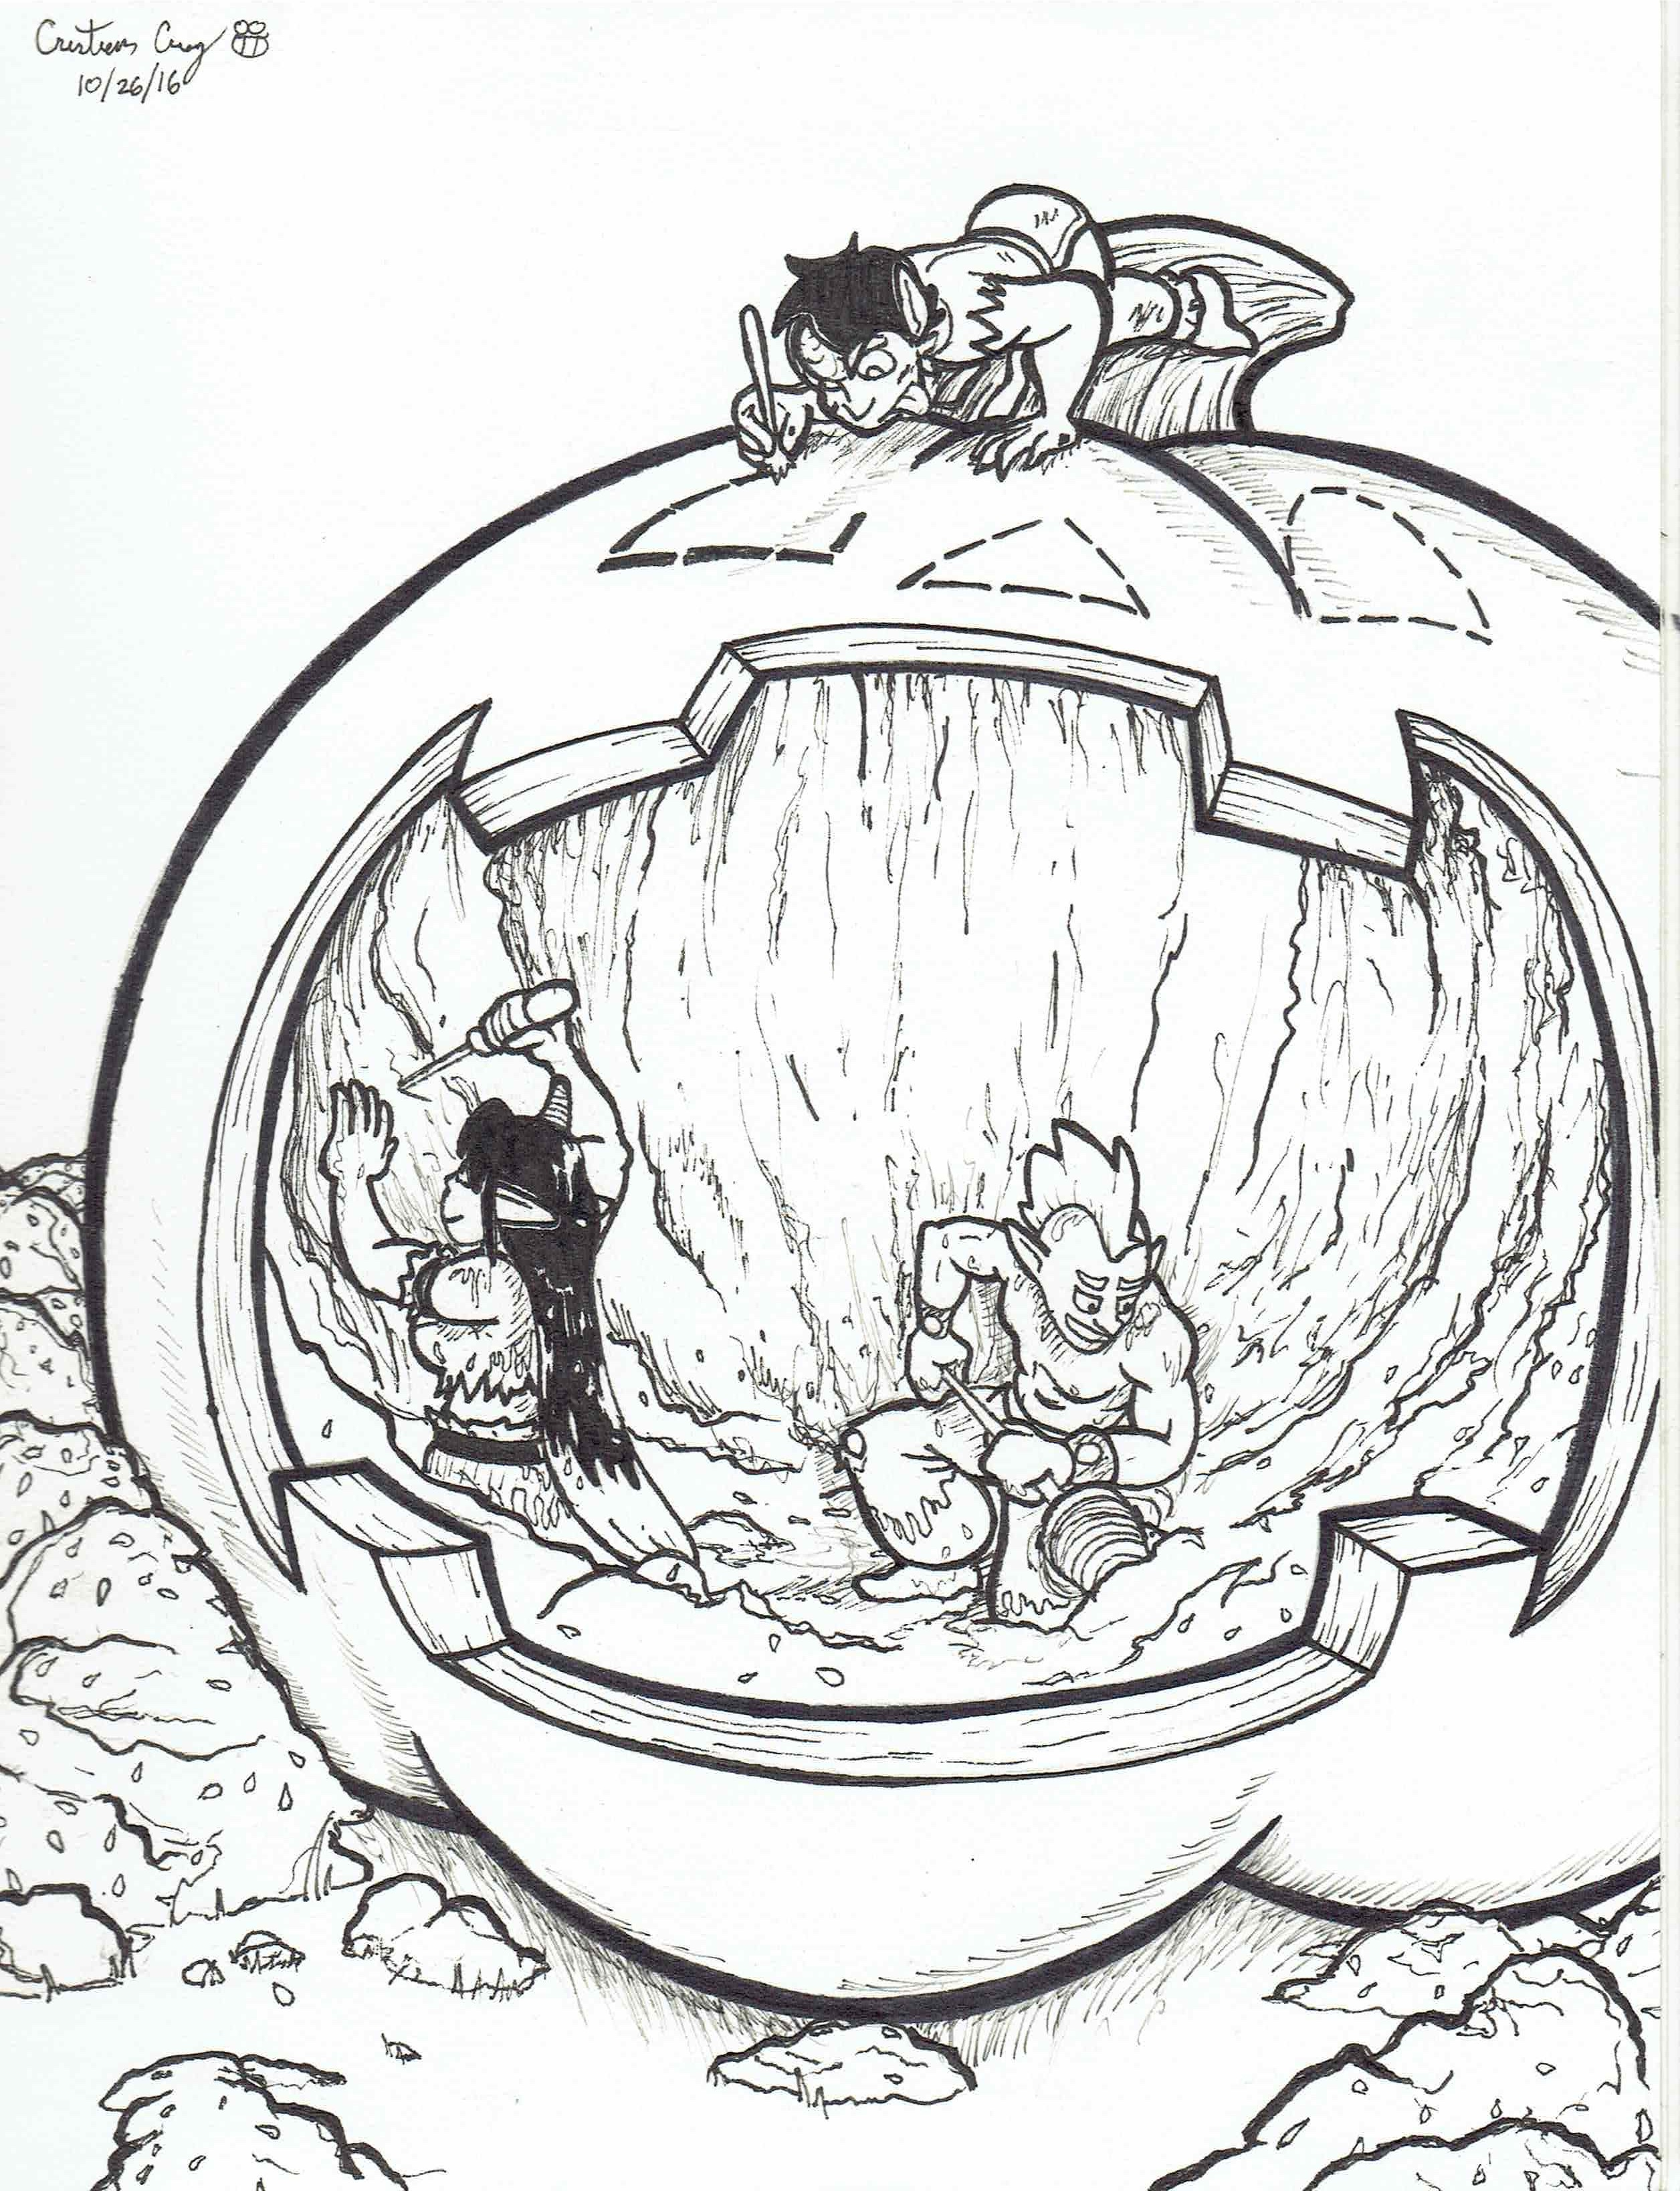 Inktober 2016 - Day 26: Pumpkin Carving